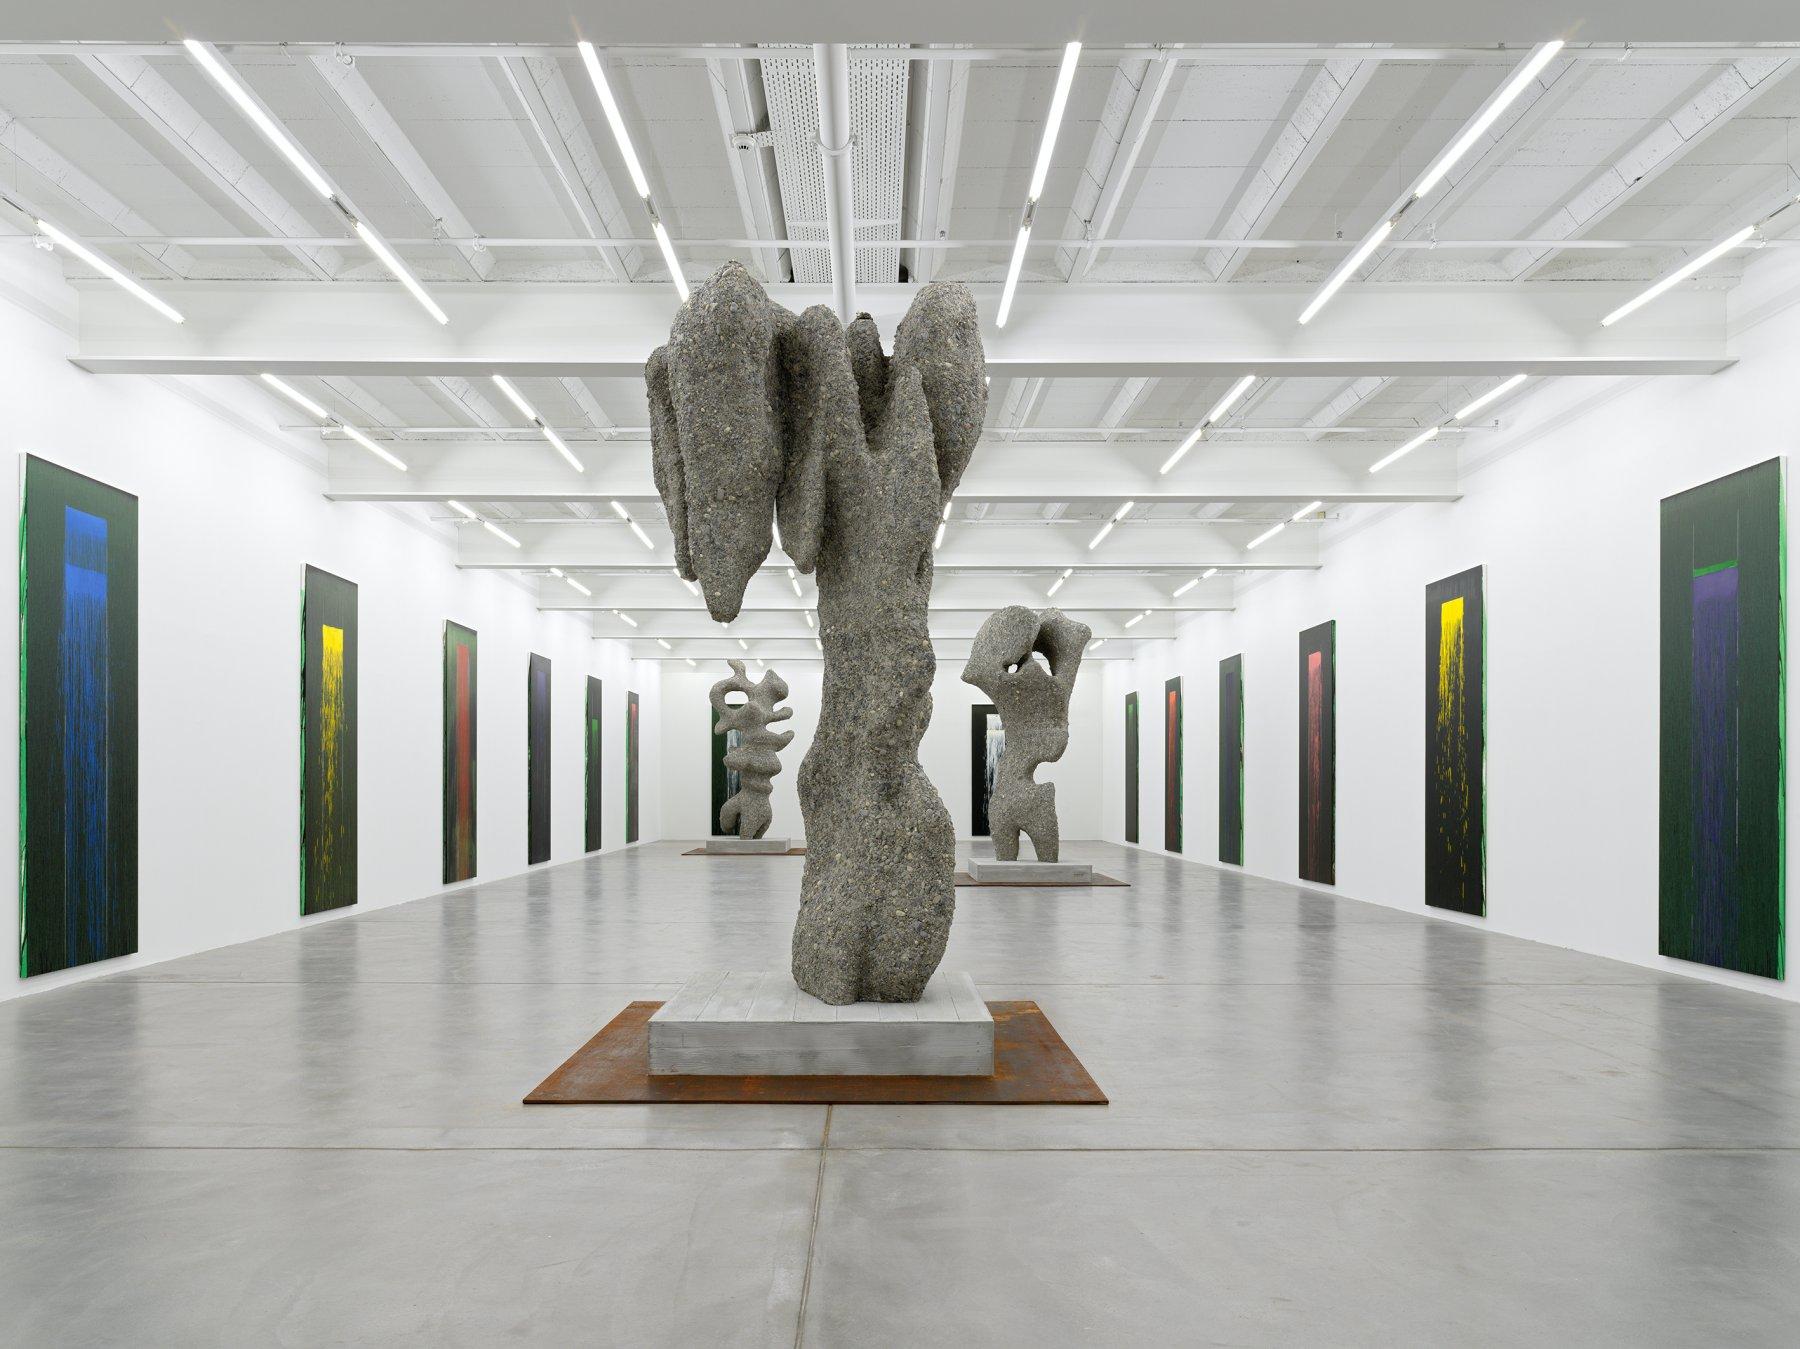 Galerie Eva Presenhuber Pat Steir Ugo Rondinone 1